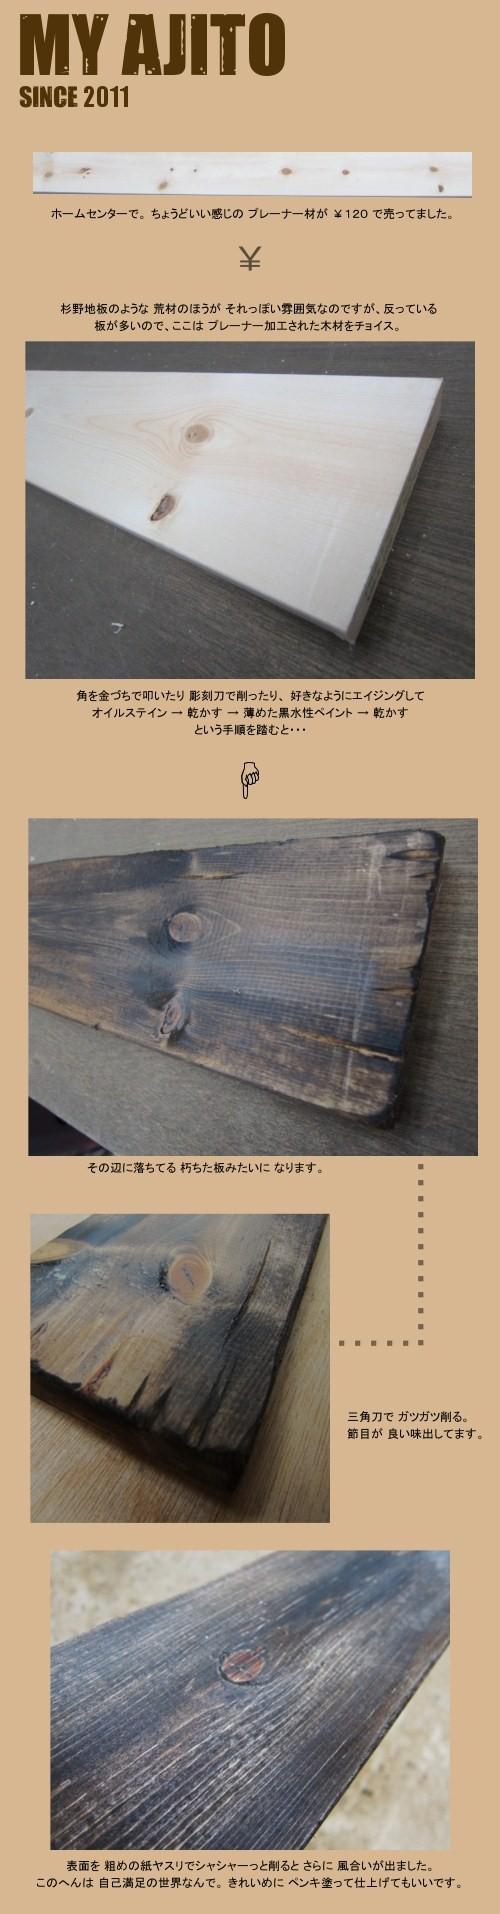 seri_f_3.jpg